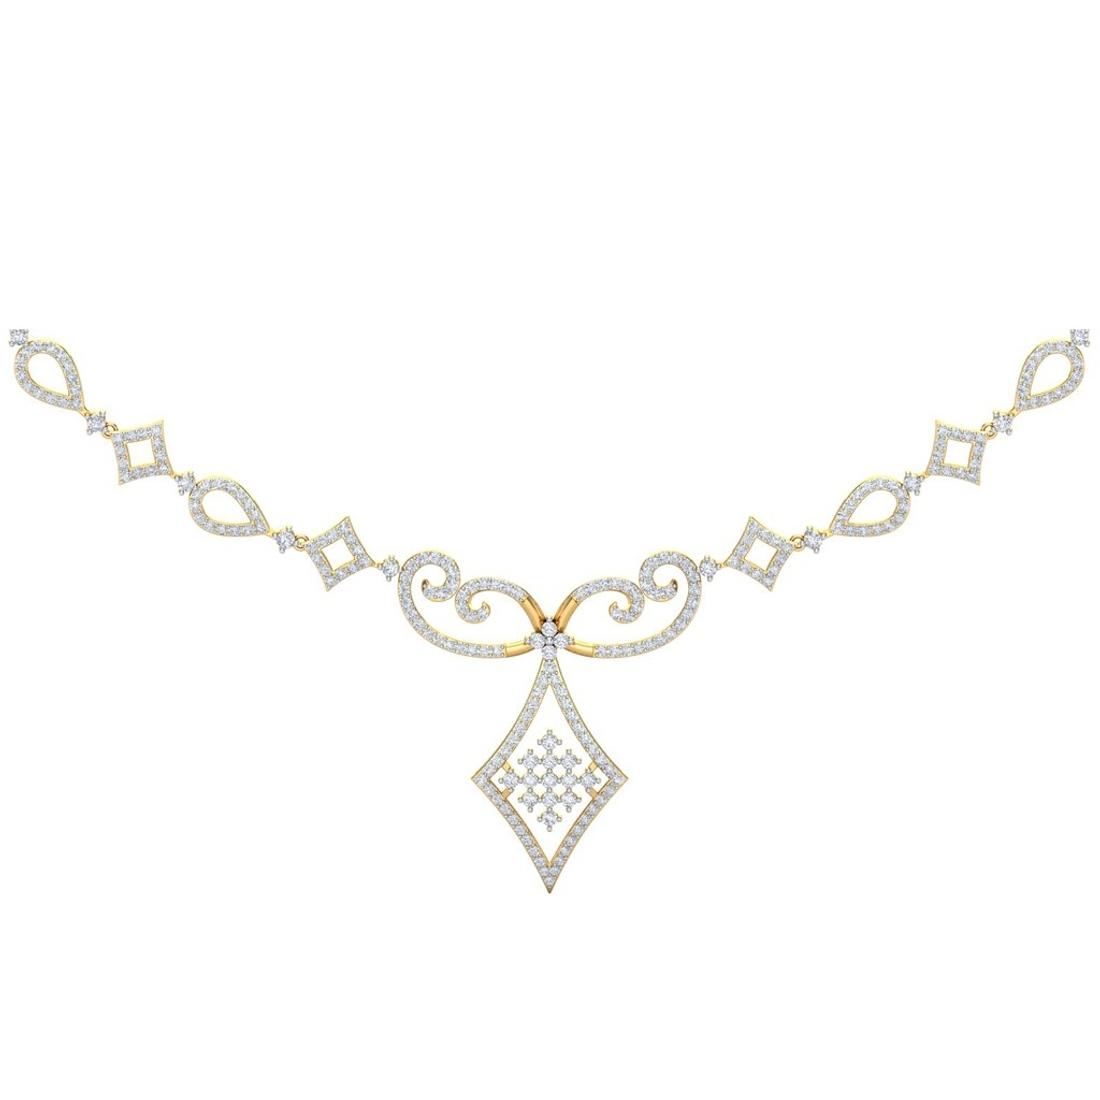 Sarvada Jewels' The Victoria Diamond Necklace